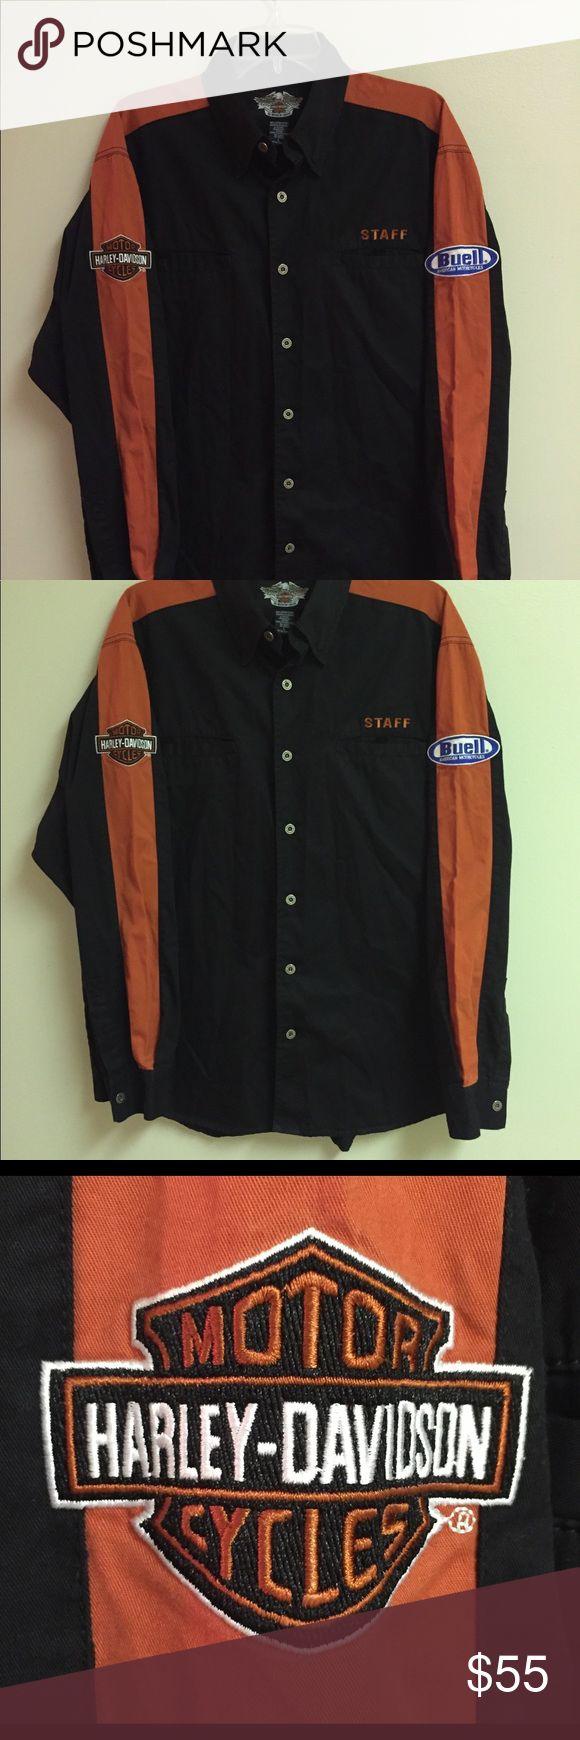 Harley Davidson shirt Harley Davidson Co Buell Motorcycles mens large button front orange black shirt Harley-Davidson Shirts Casual Button Down Shirts